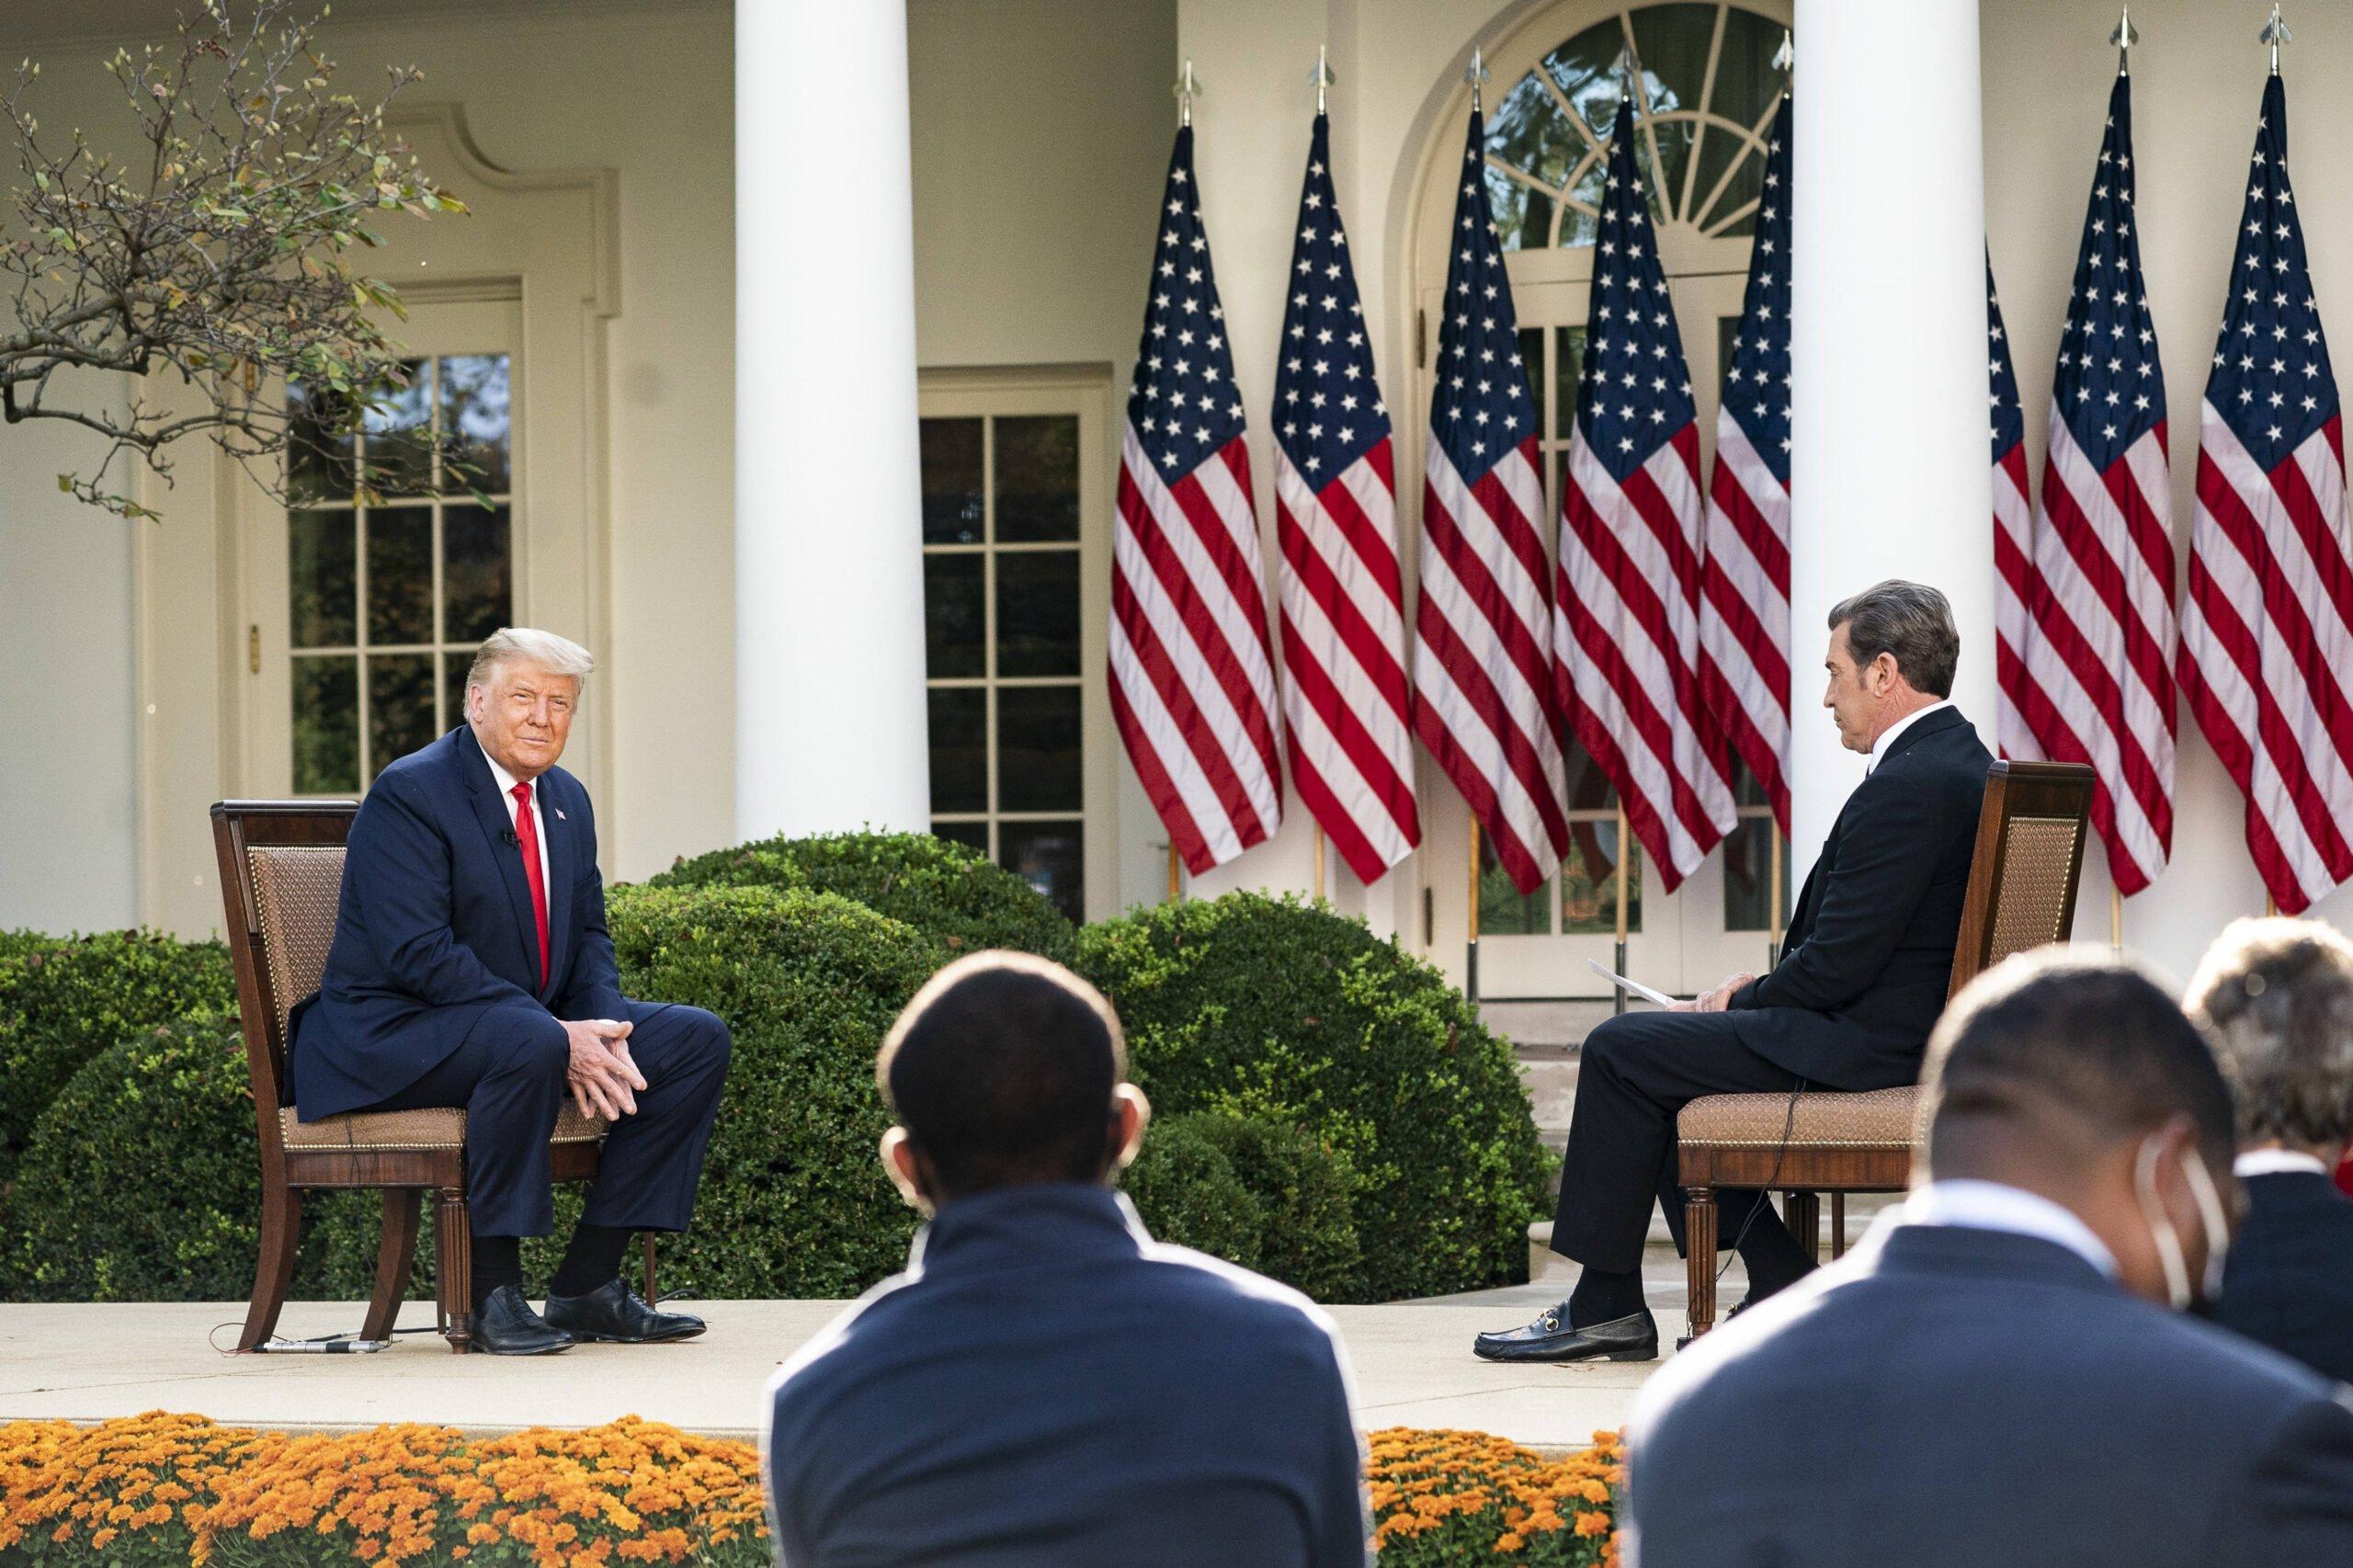 Usa 2020 - Trump - Fox News - Twitter - esodo